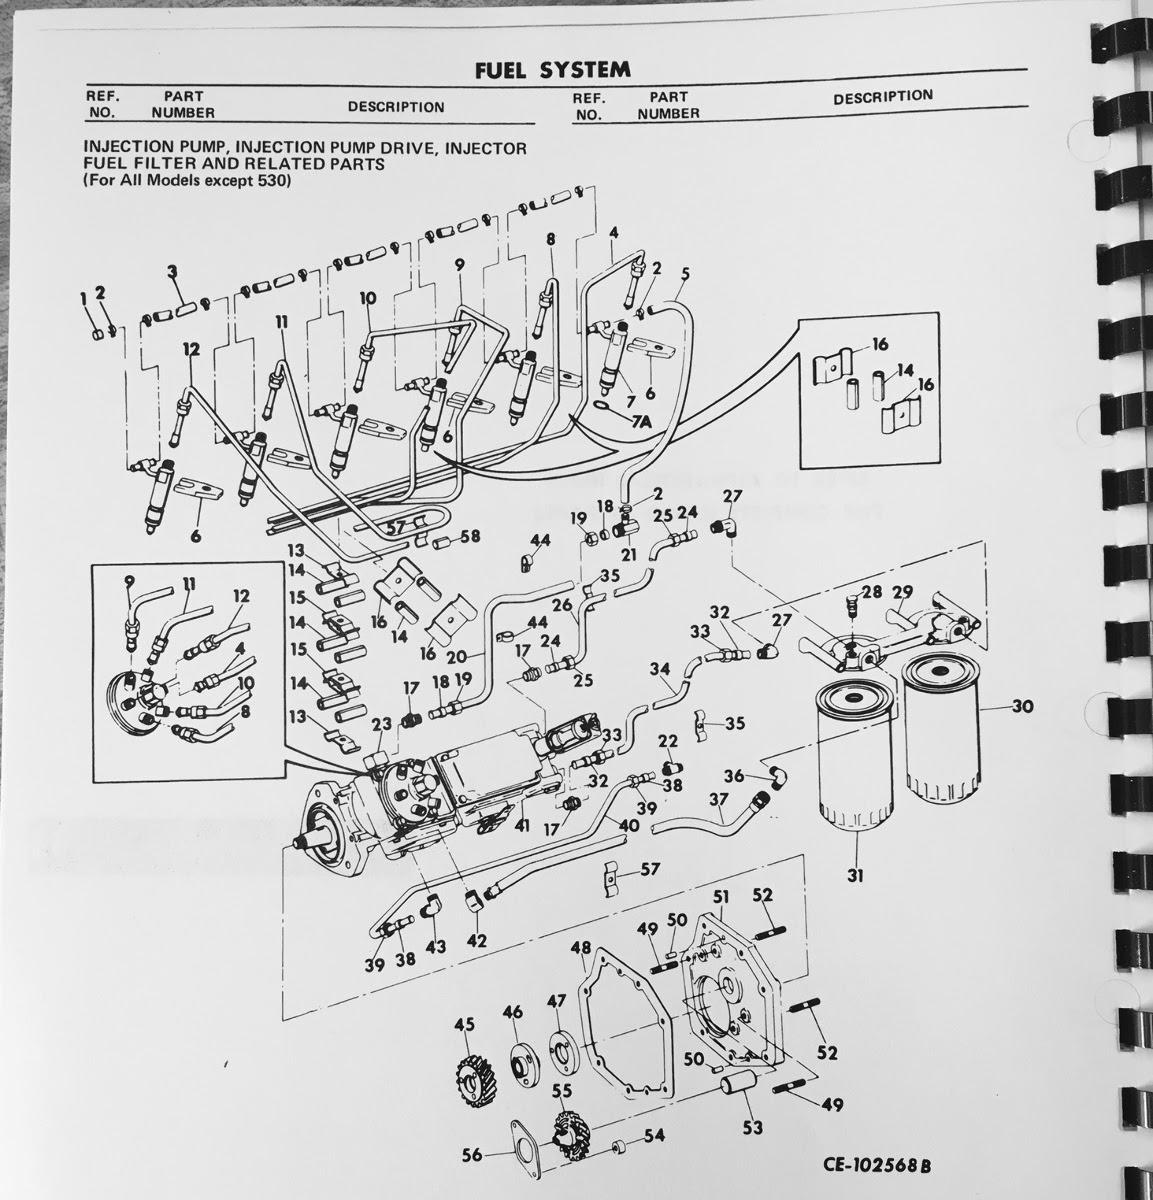 33 International Dt466 Fuel System Diagram - Wiring ...